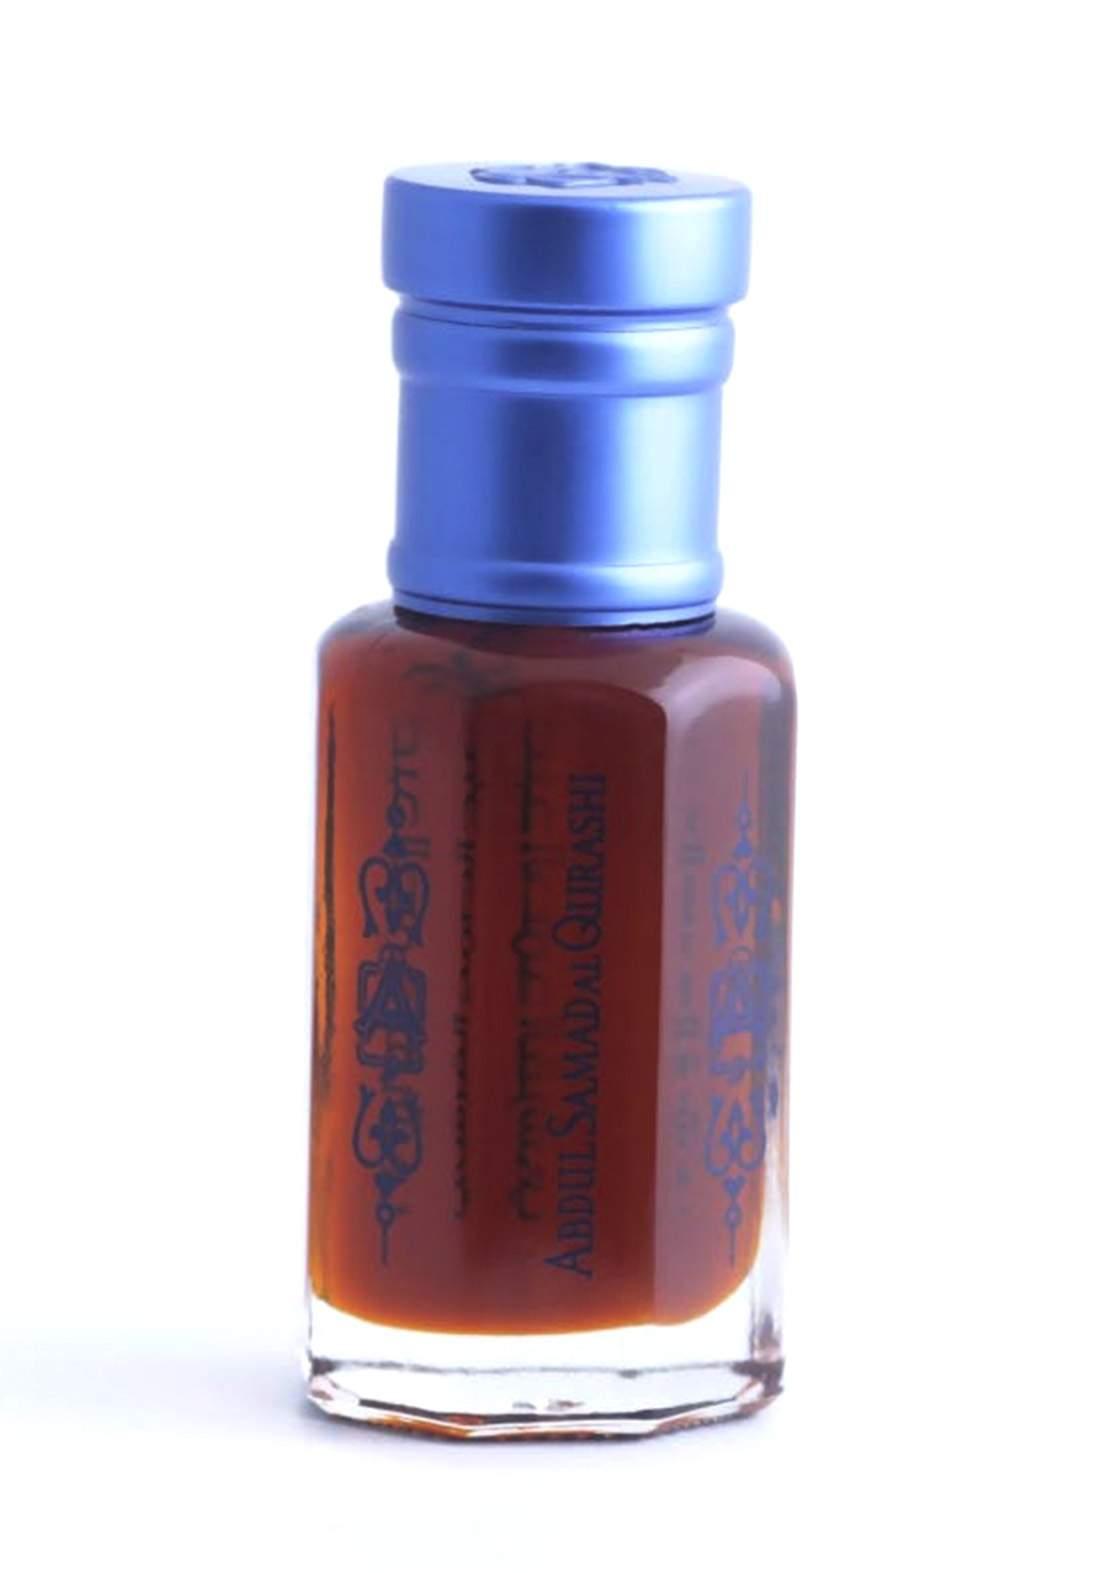 Abdul Samad Al Qurashi 31230 Al Qurashi Blend 500 Perfume Oil عطر زيتي رجالي ونسائي